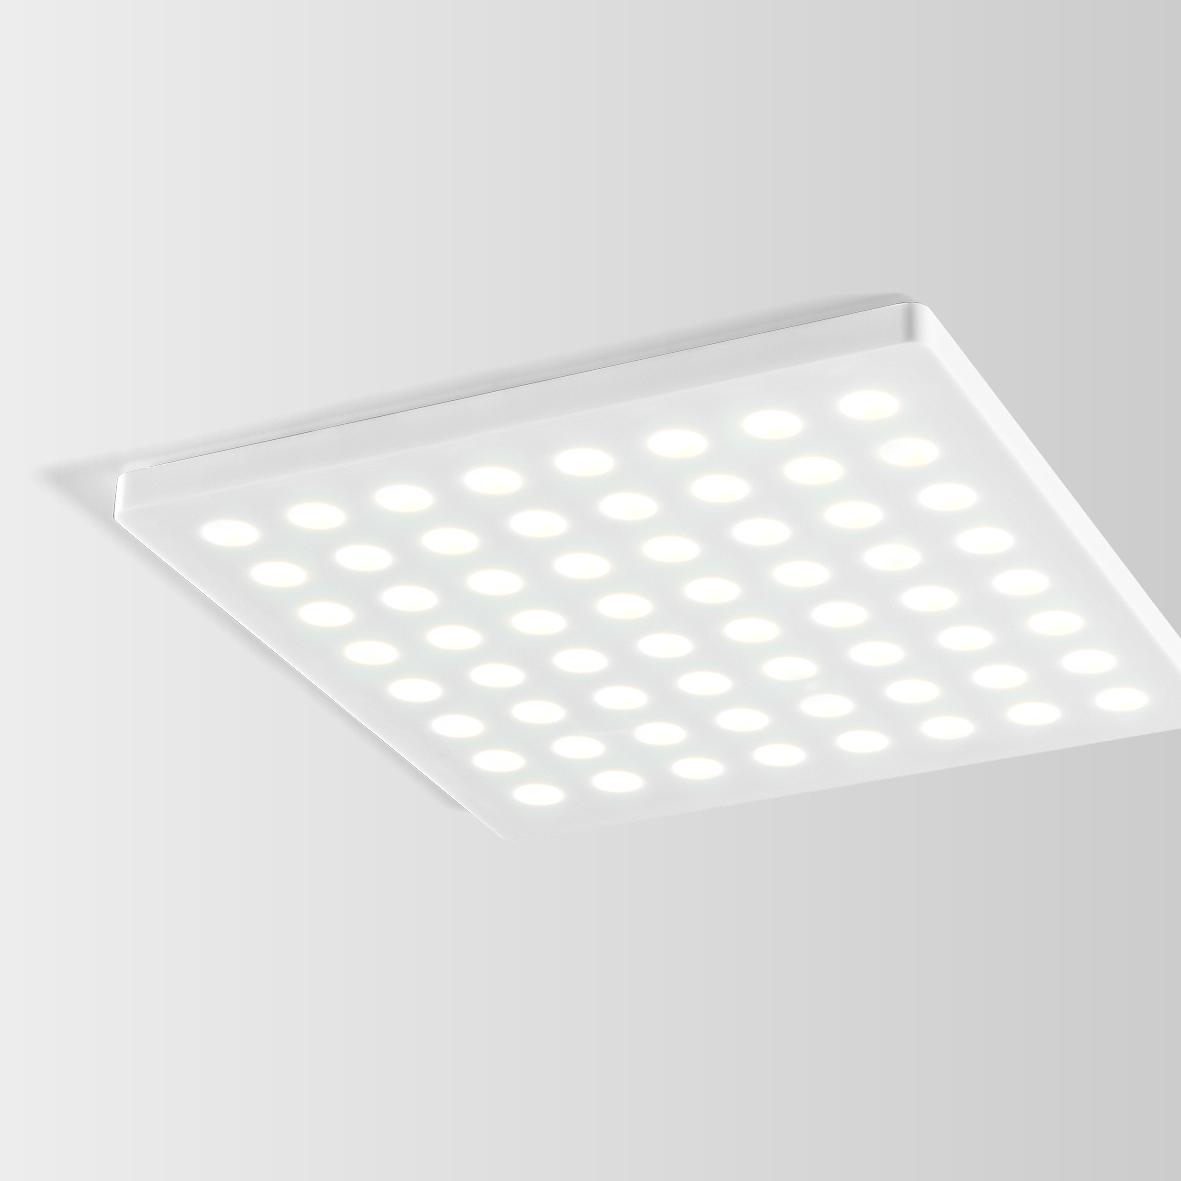 CORO 2.5 LED 3000K DIM VALGE 20W 85CRI 220-240VAC